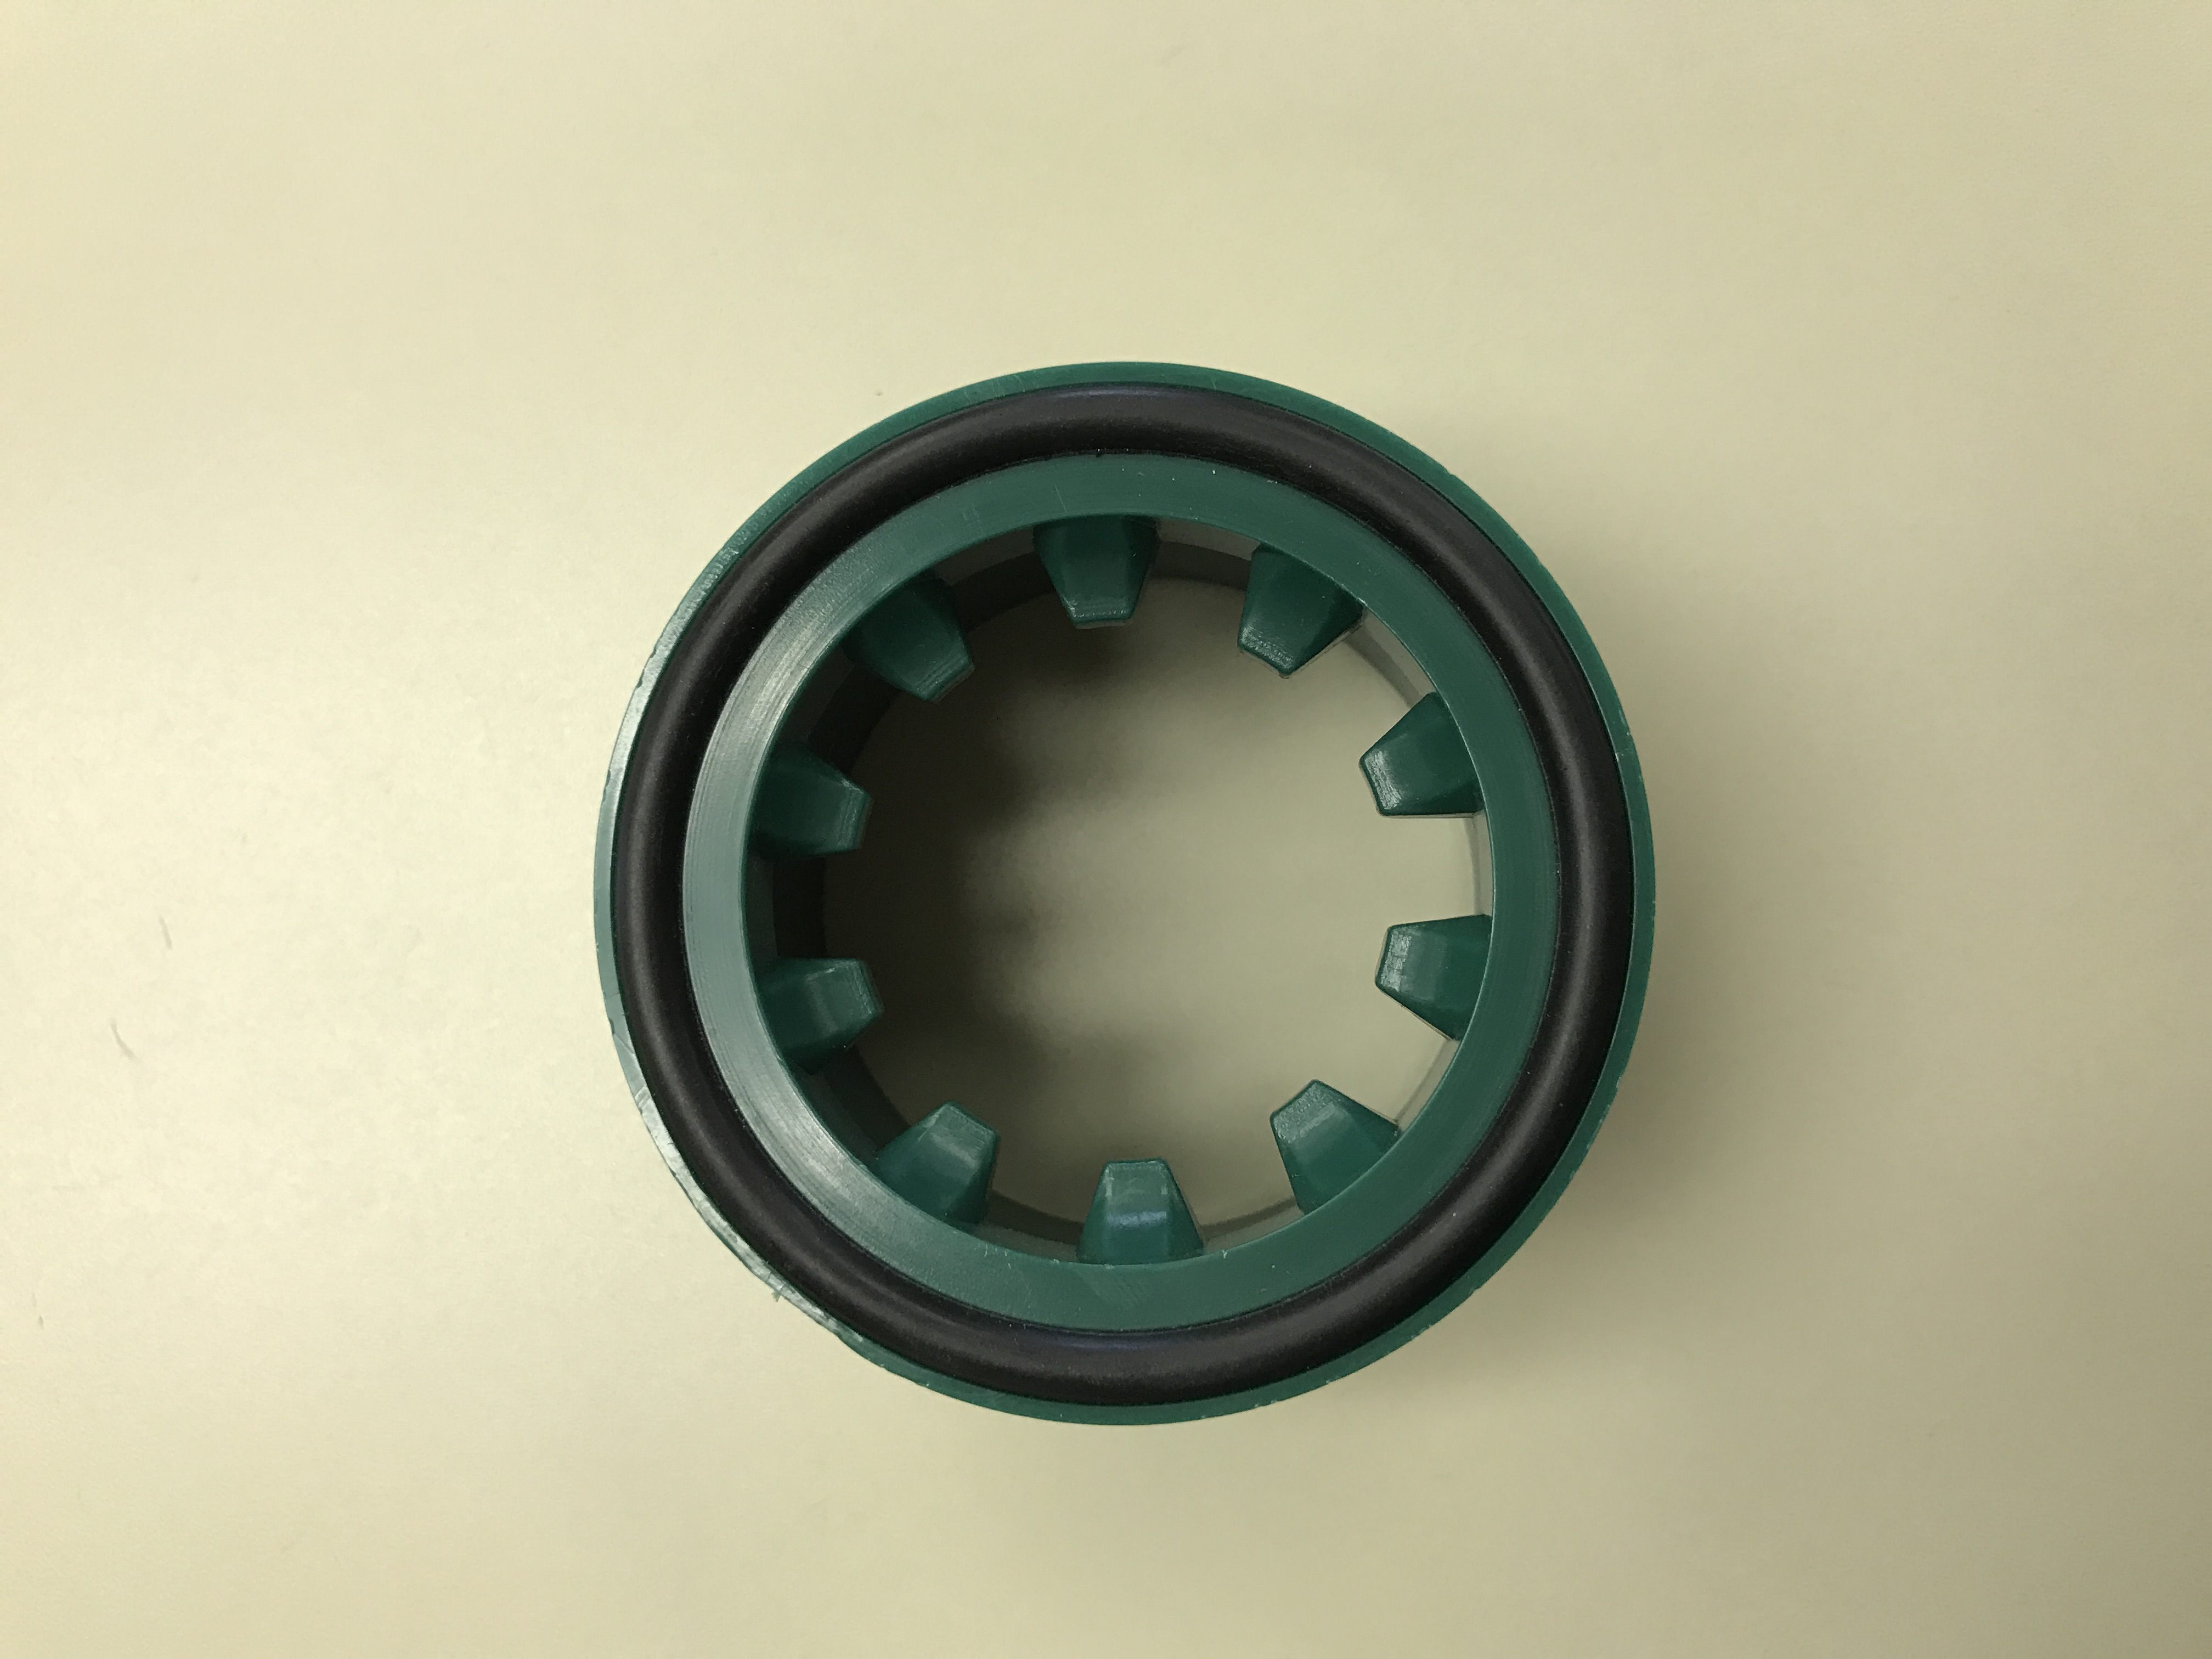 Green-dual-source-heating-element